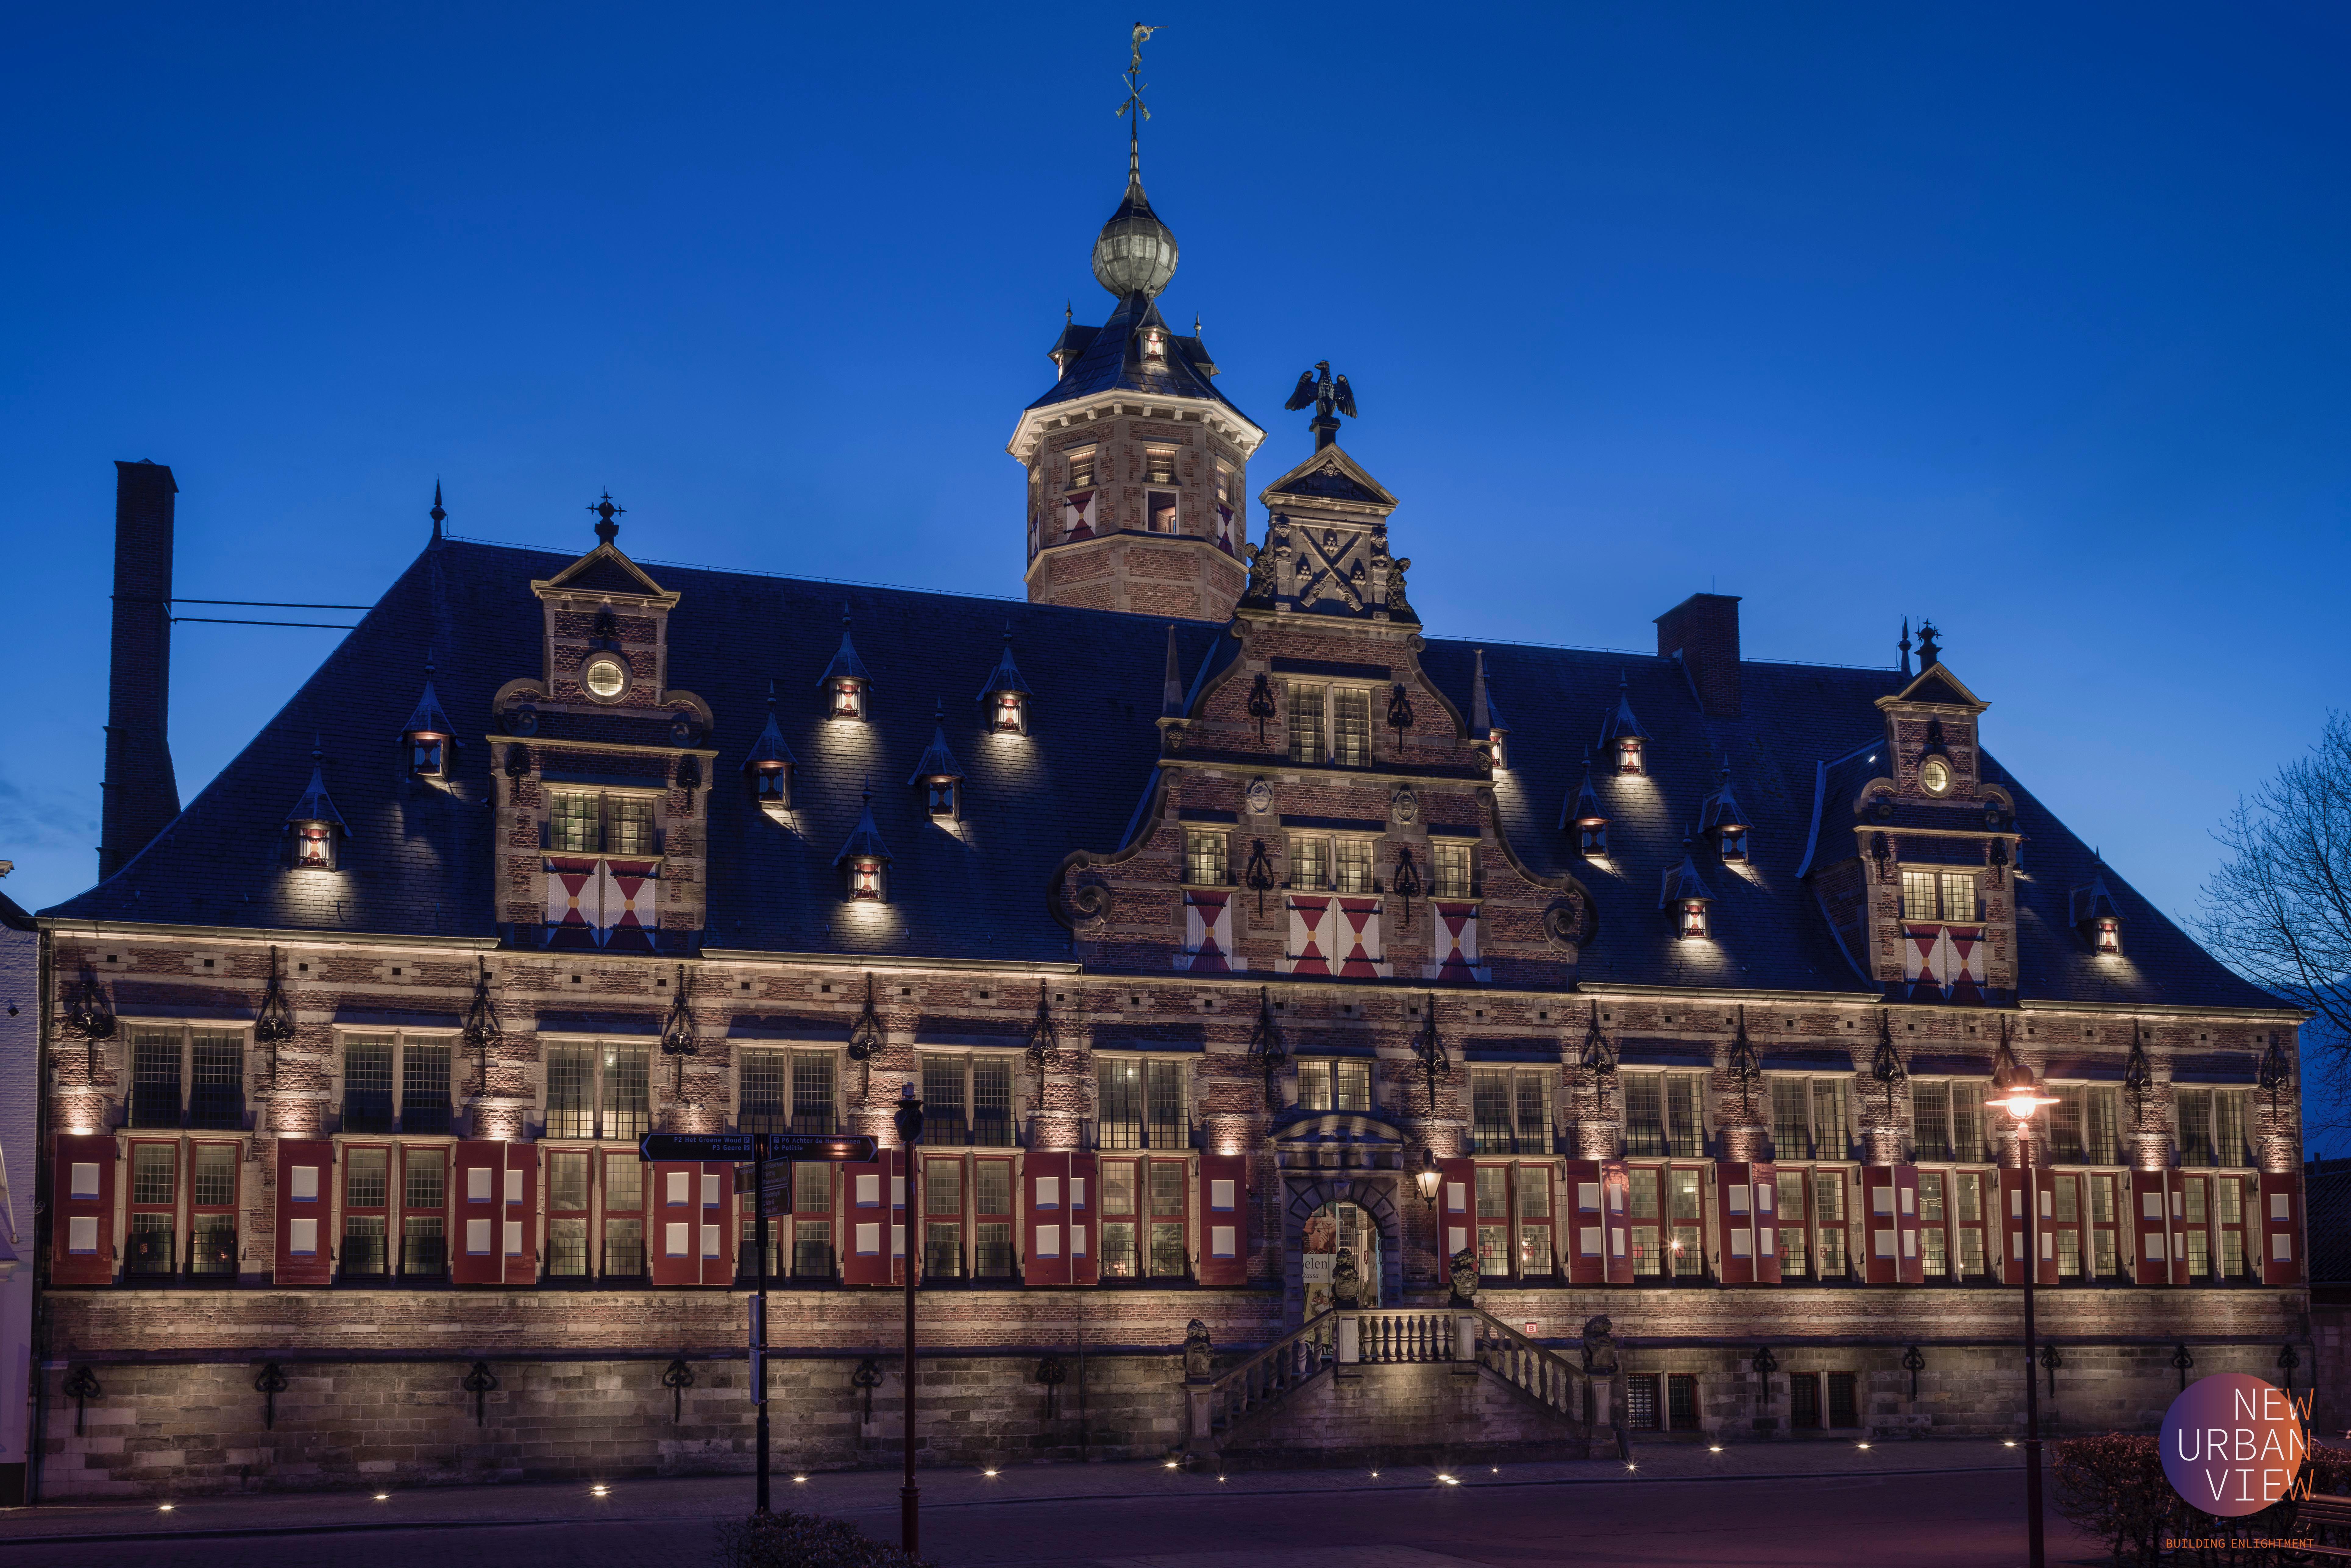 NEWURBANVIEW-architectural-lighting-Kloveniersdoelen-Middelburg-jeroen-jans-1